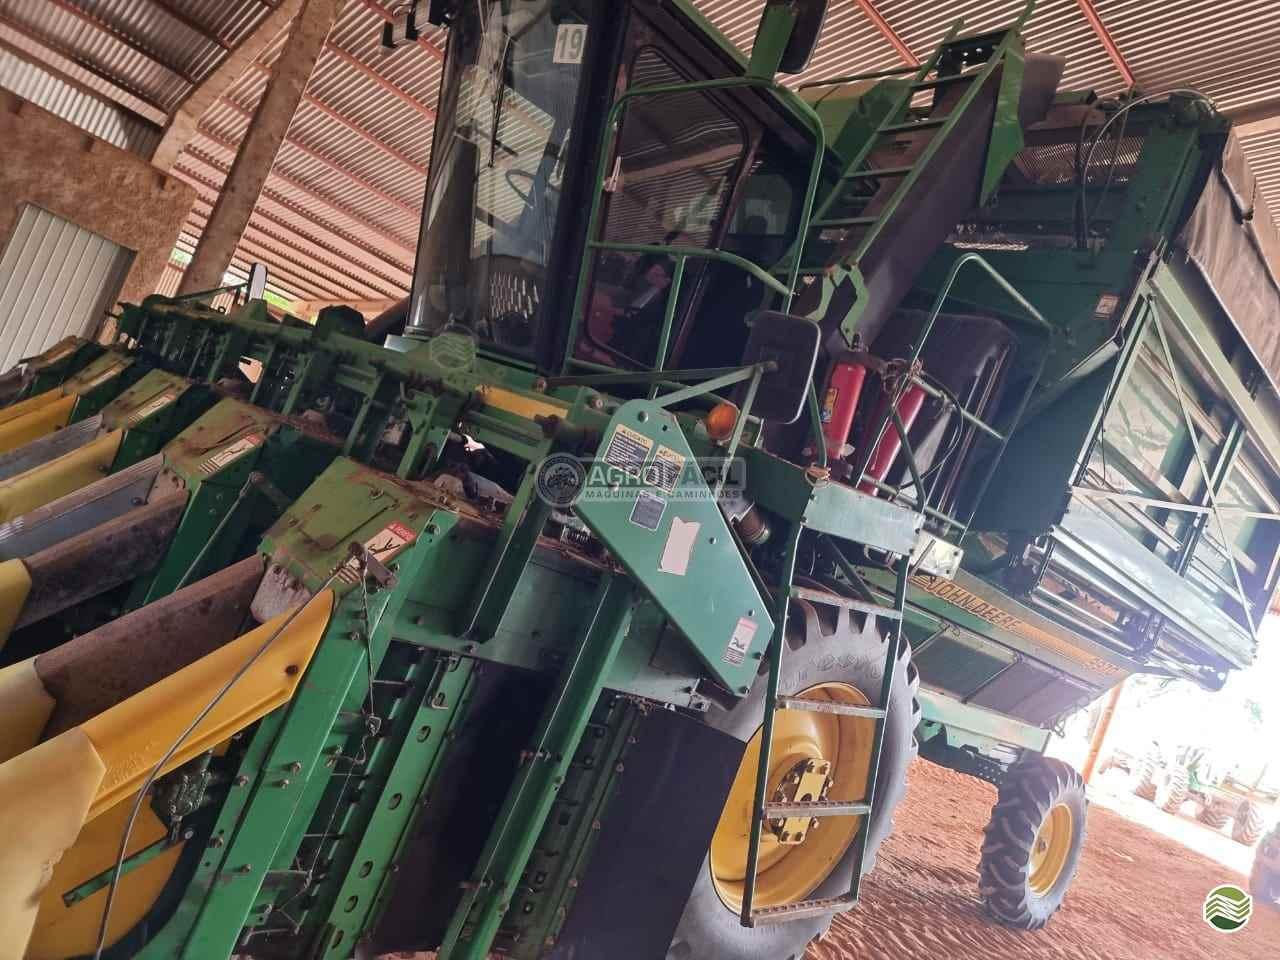 JOHN DEERE ALG. 9970 de Agro Fácil Máquinas - PRIMAVERA DO LESTE/MT